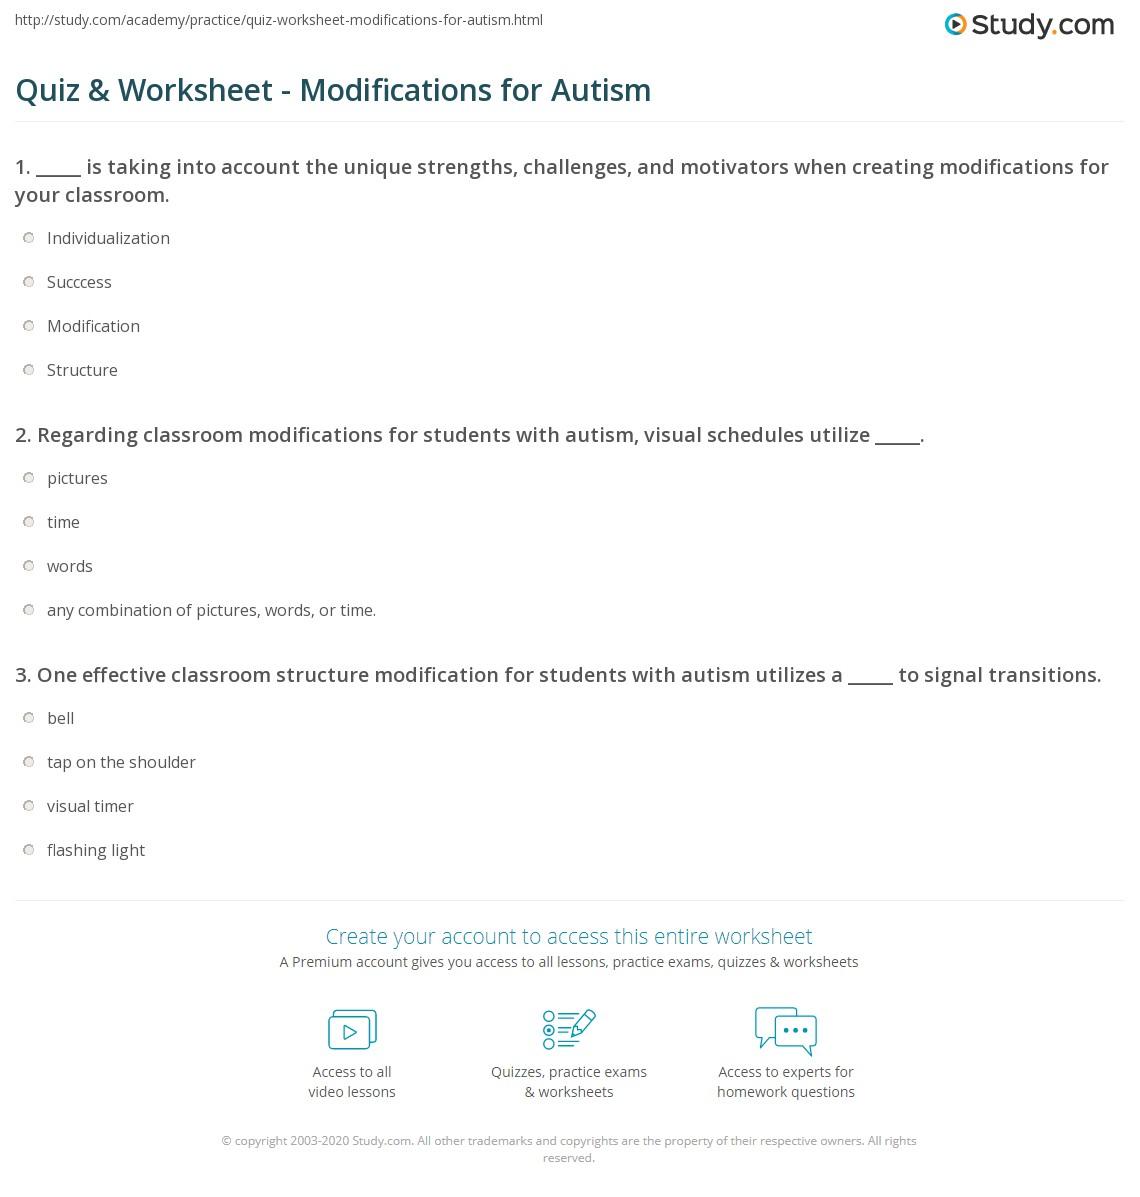 Quiz & Worksheet - Modifications for Autism | Study.com